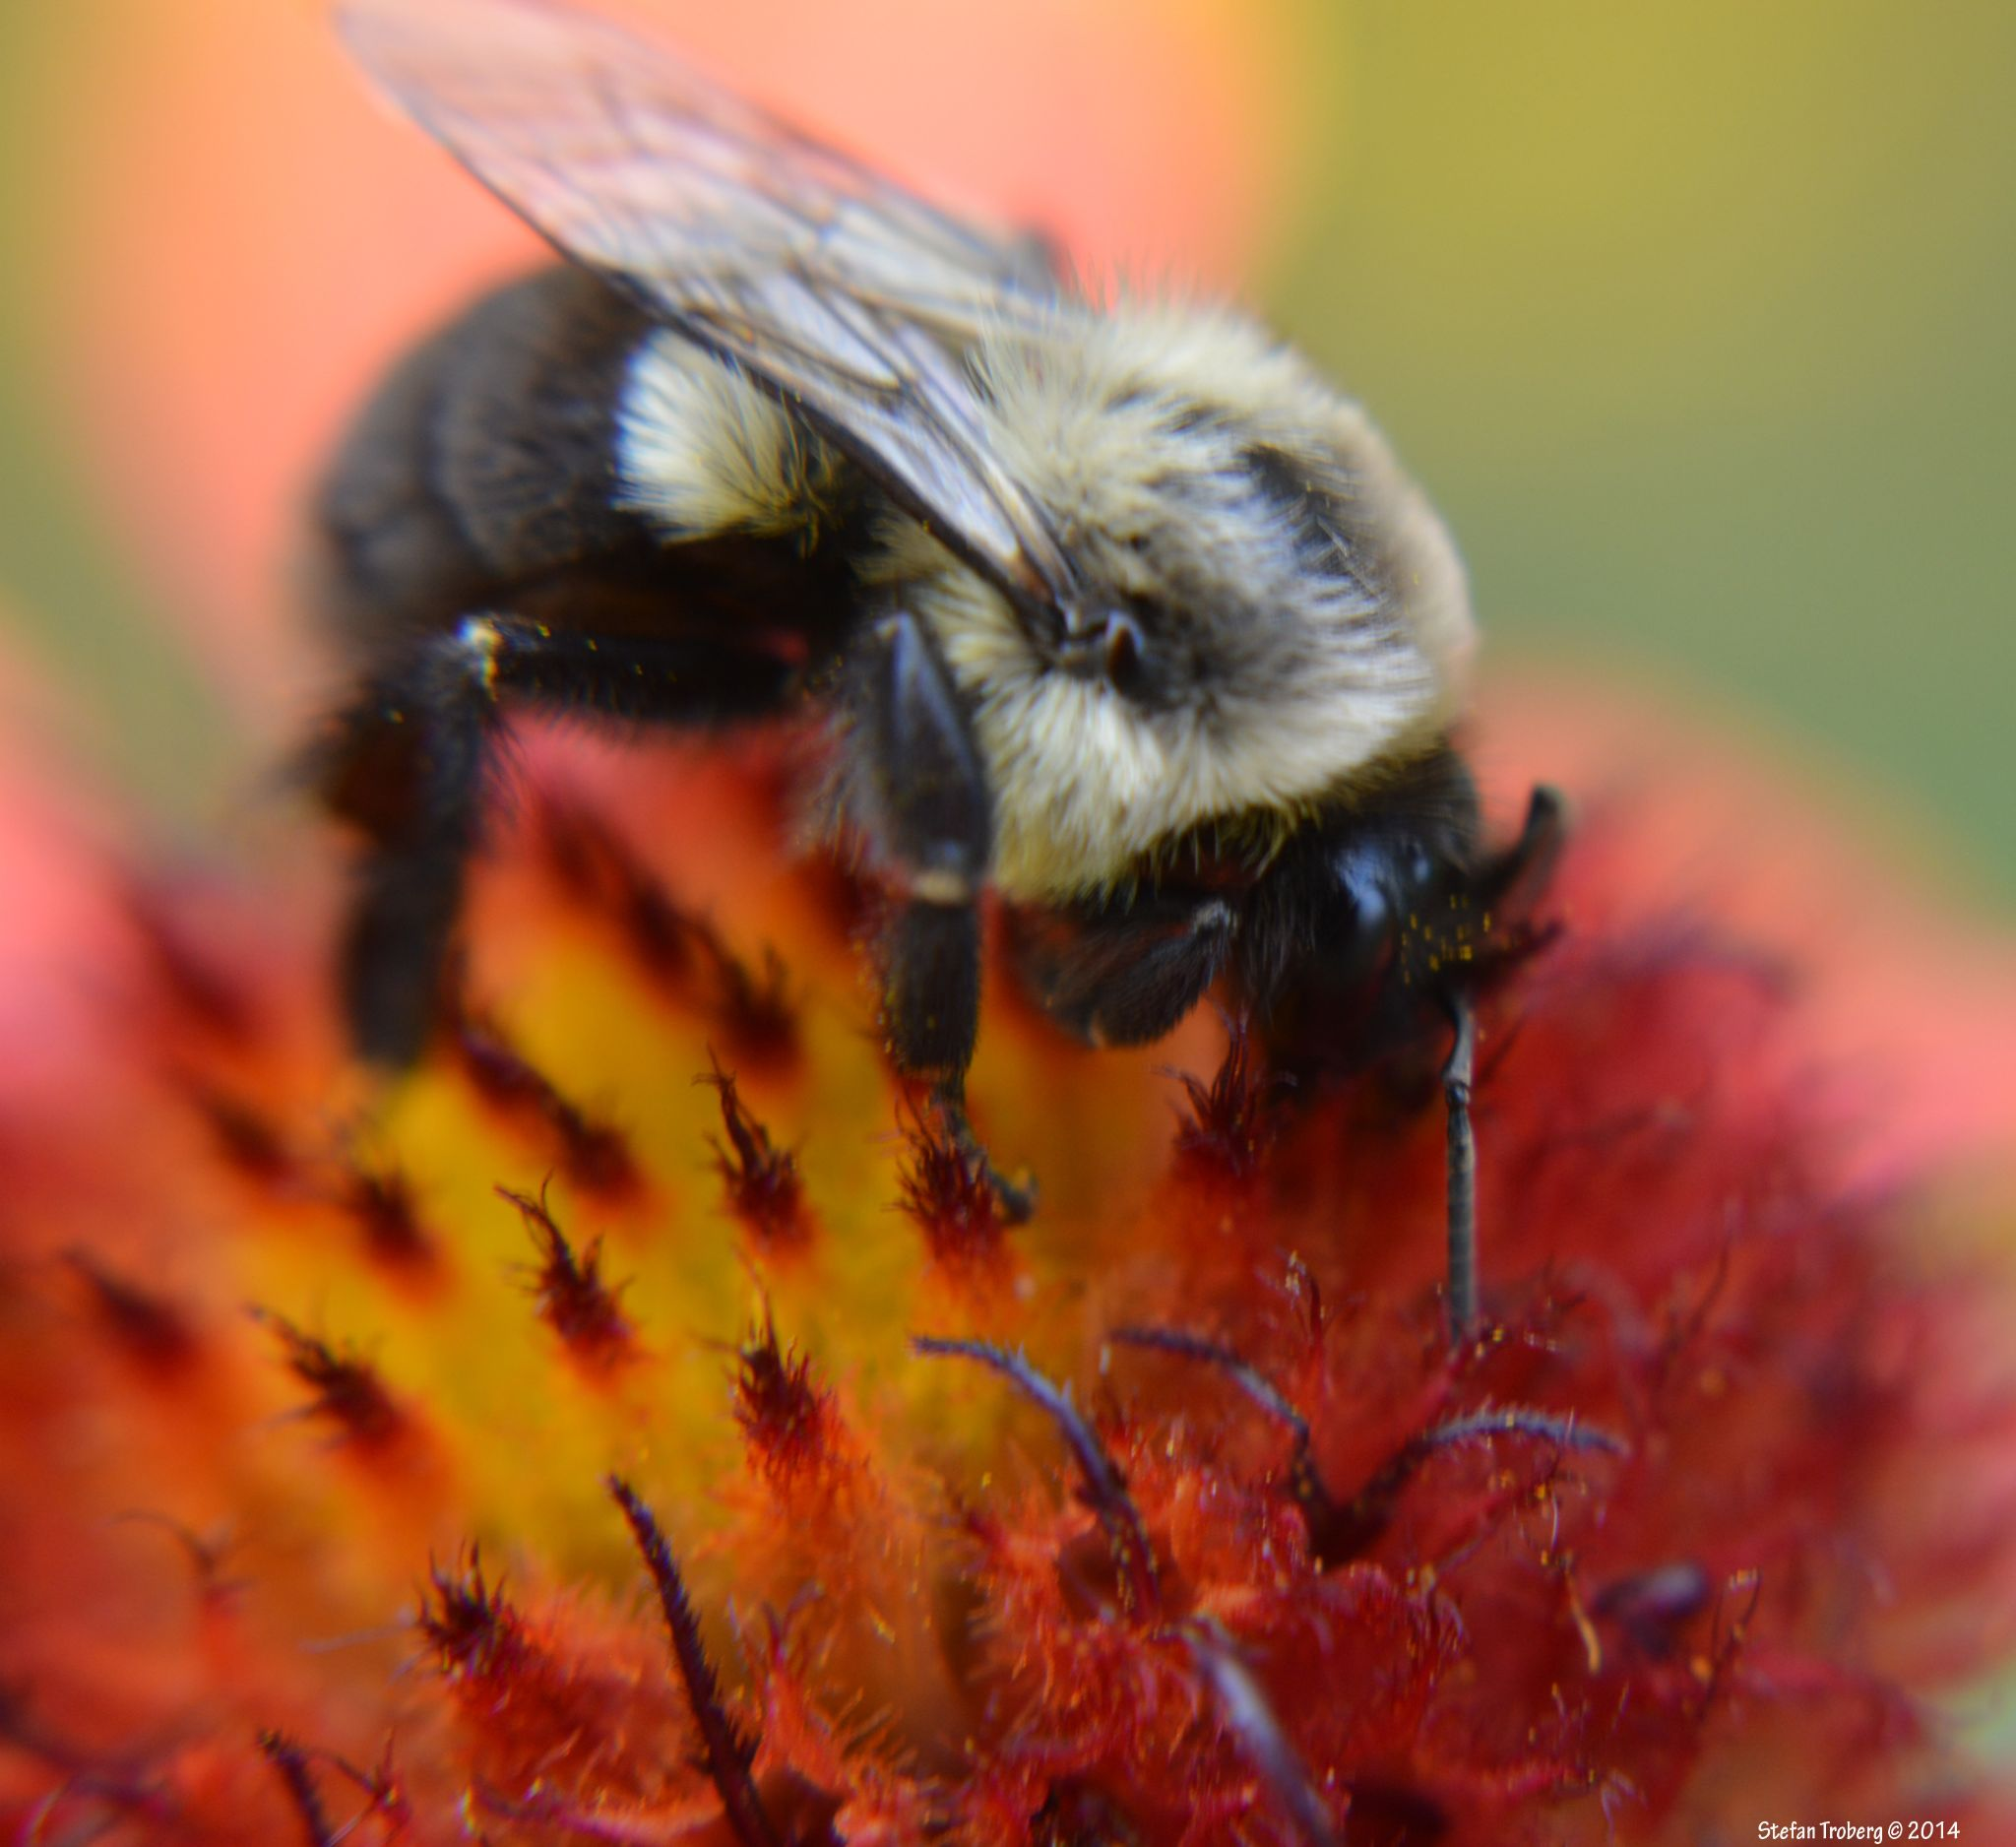 Bumblebee working hard for pollen by Stefan Troberg